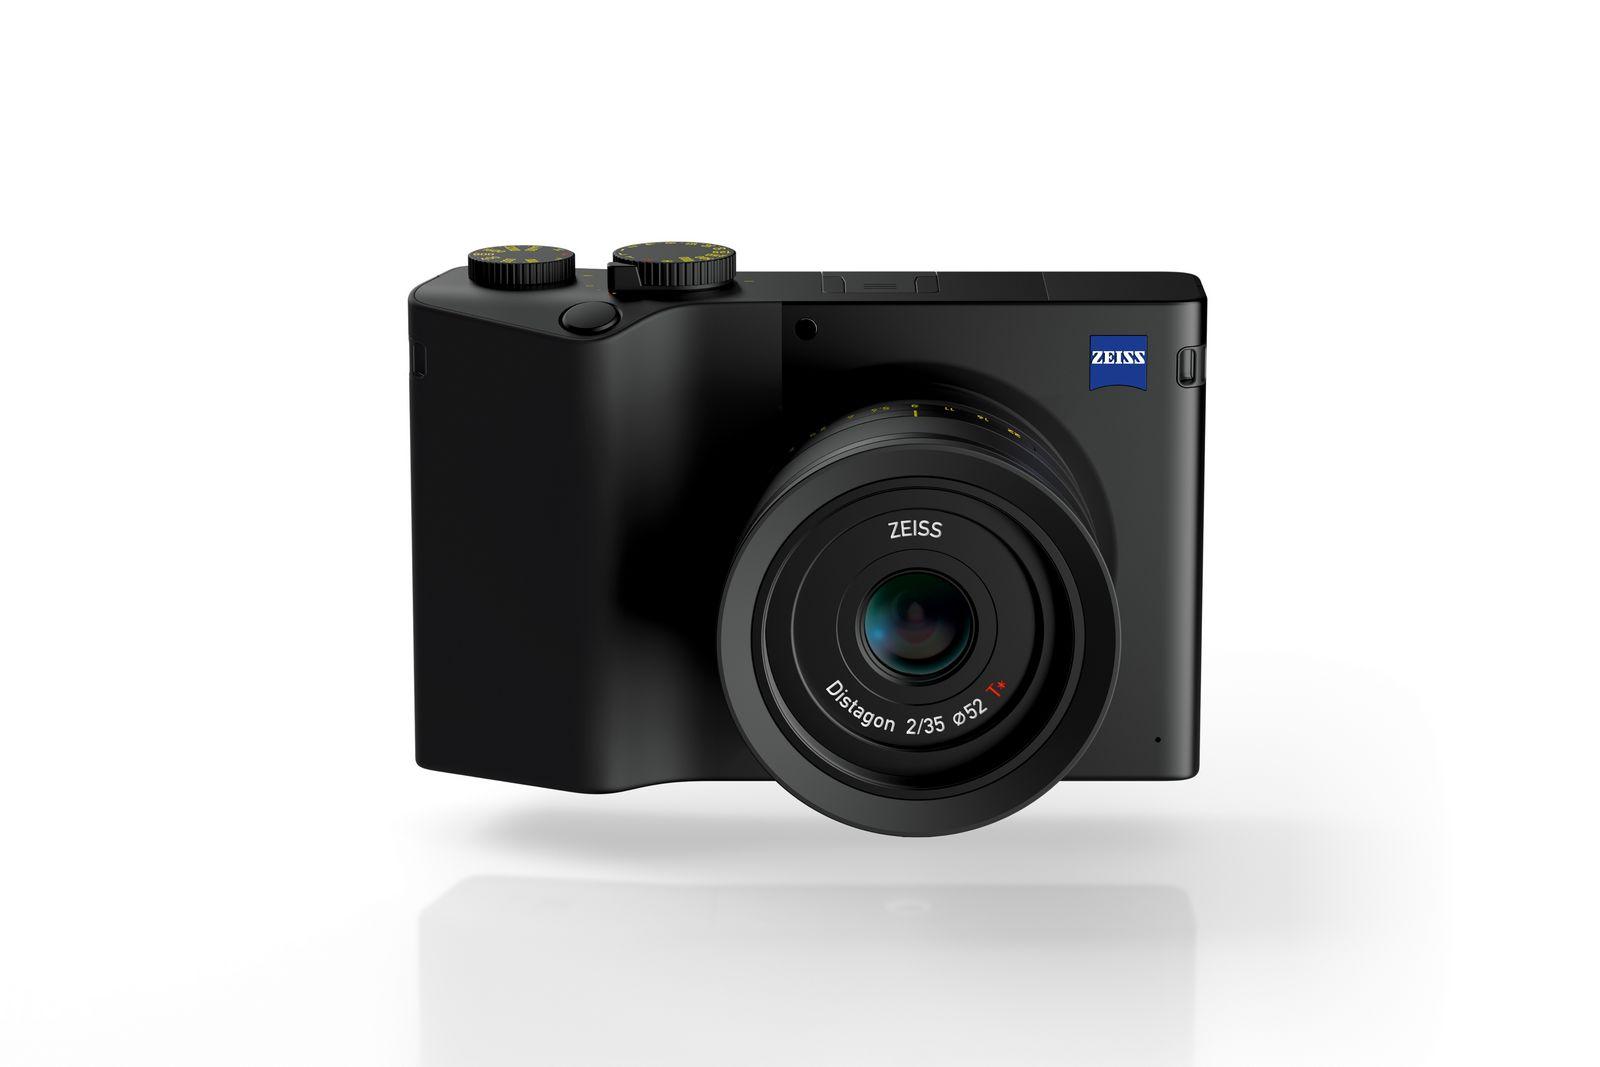 Zeiss 首款數位相機 ZX1 是一台全幅定焦隨身機